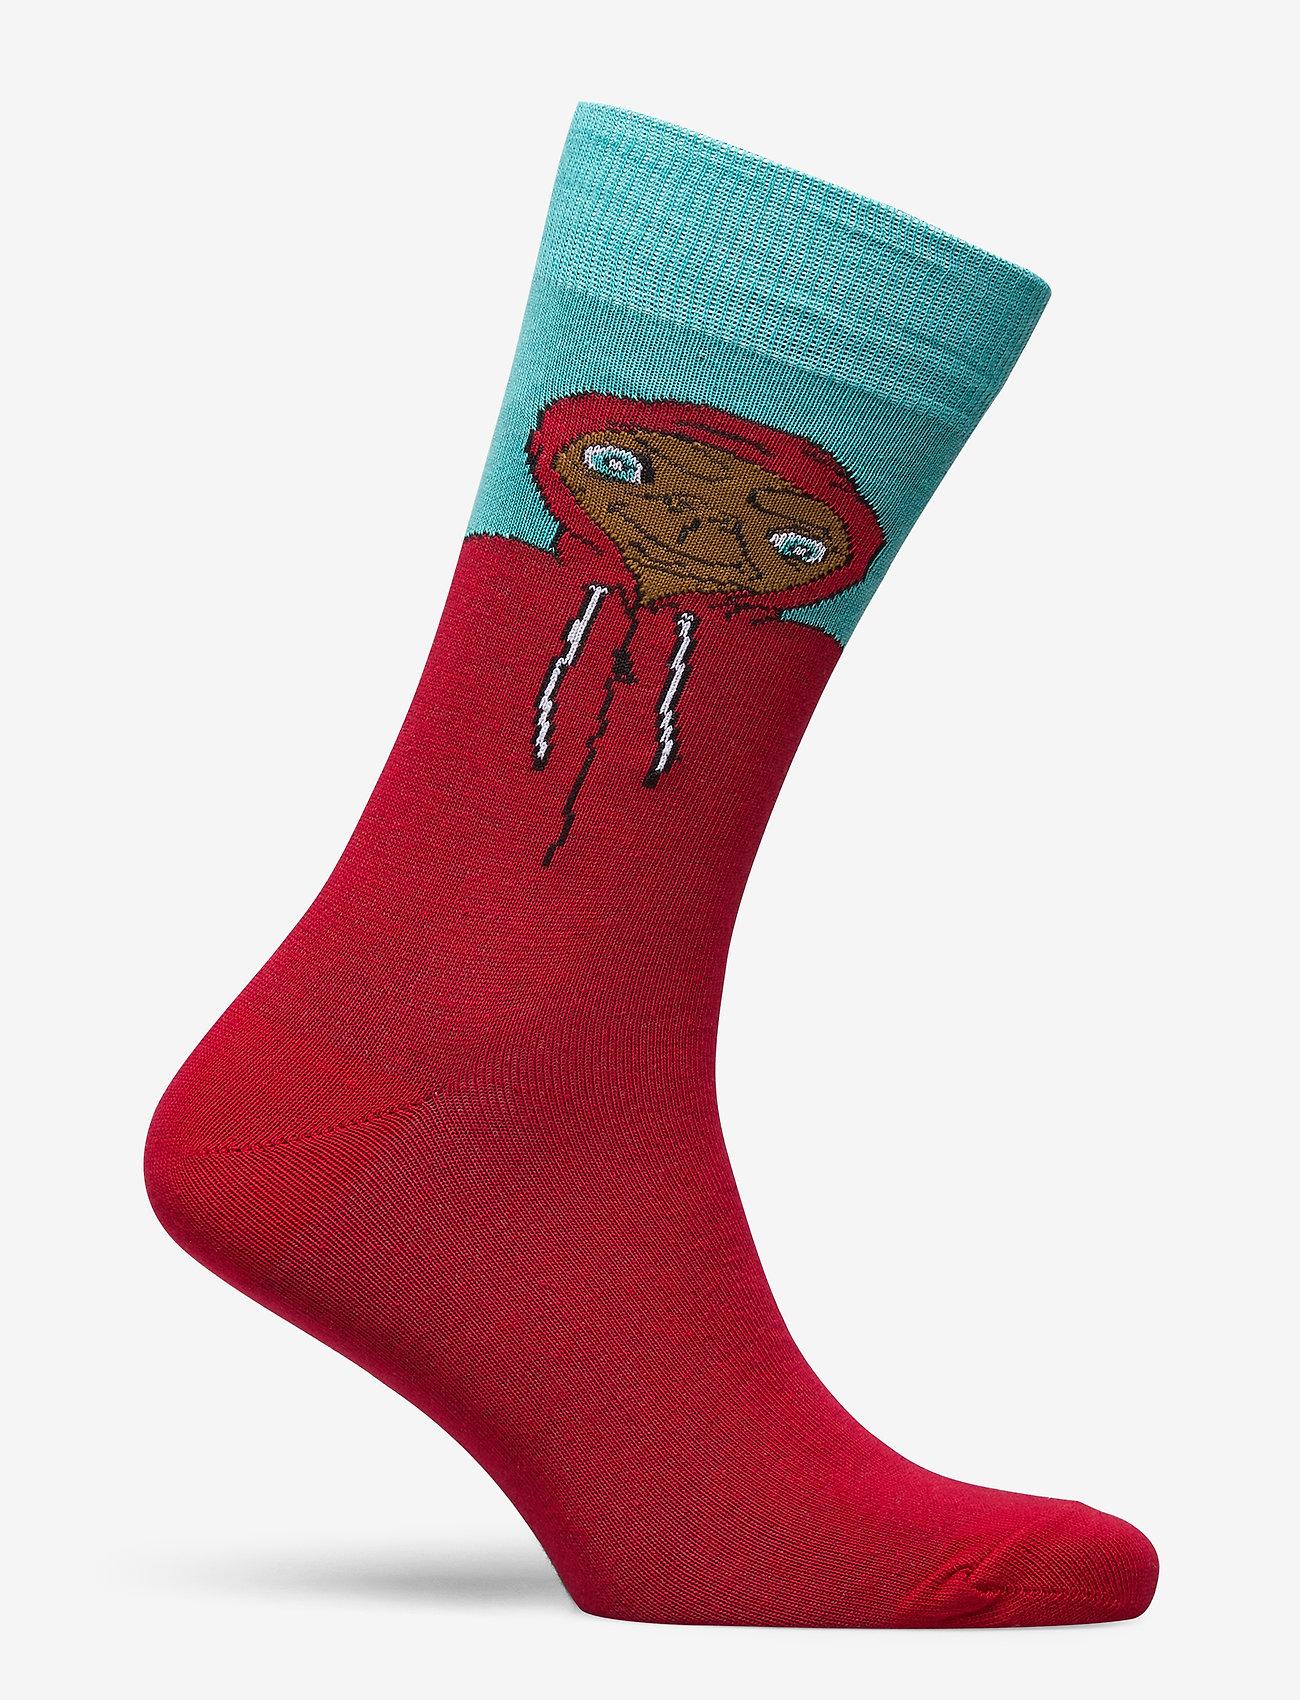 DEDICATED Socks Sigtuna Extra Terrestrial - Sokker RED - Menn Klær